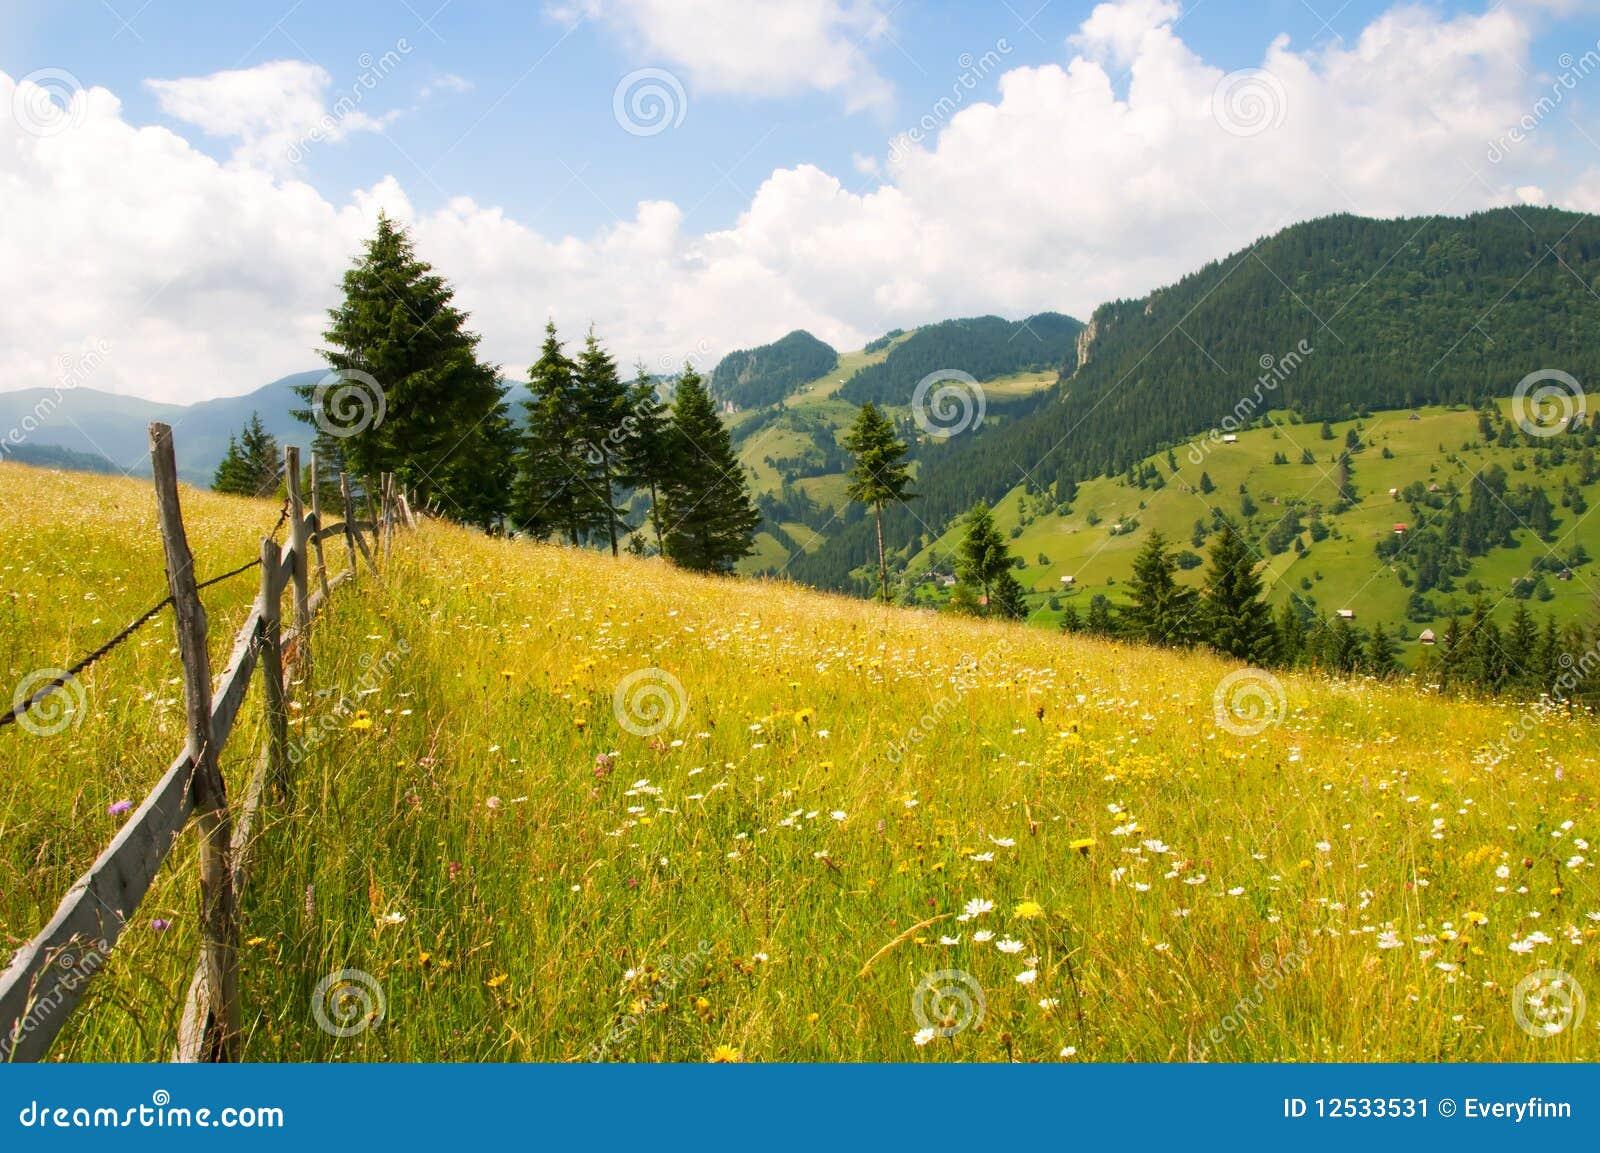 Grassfield